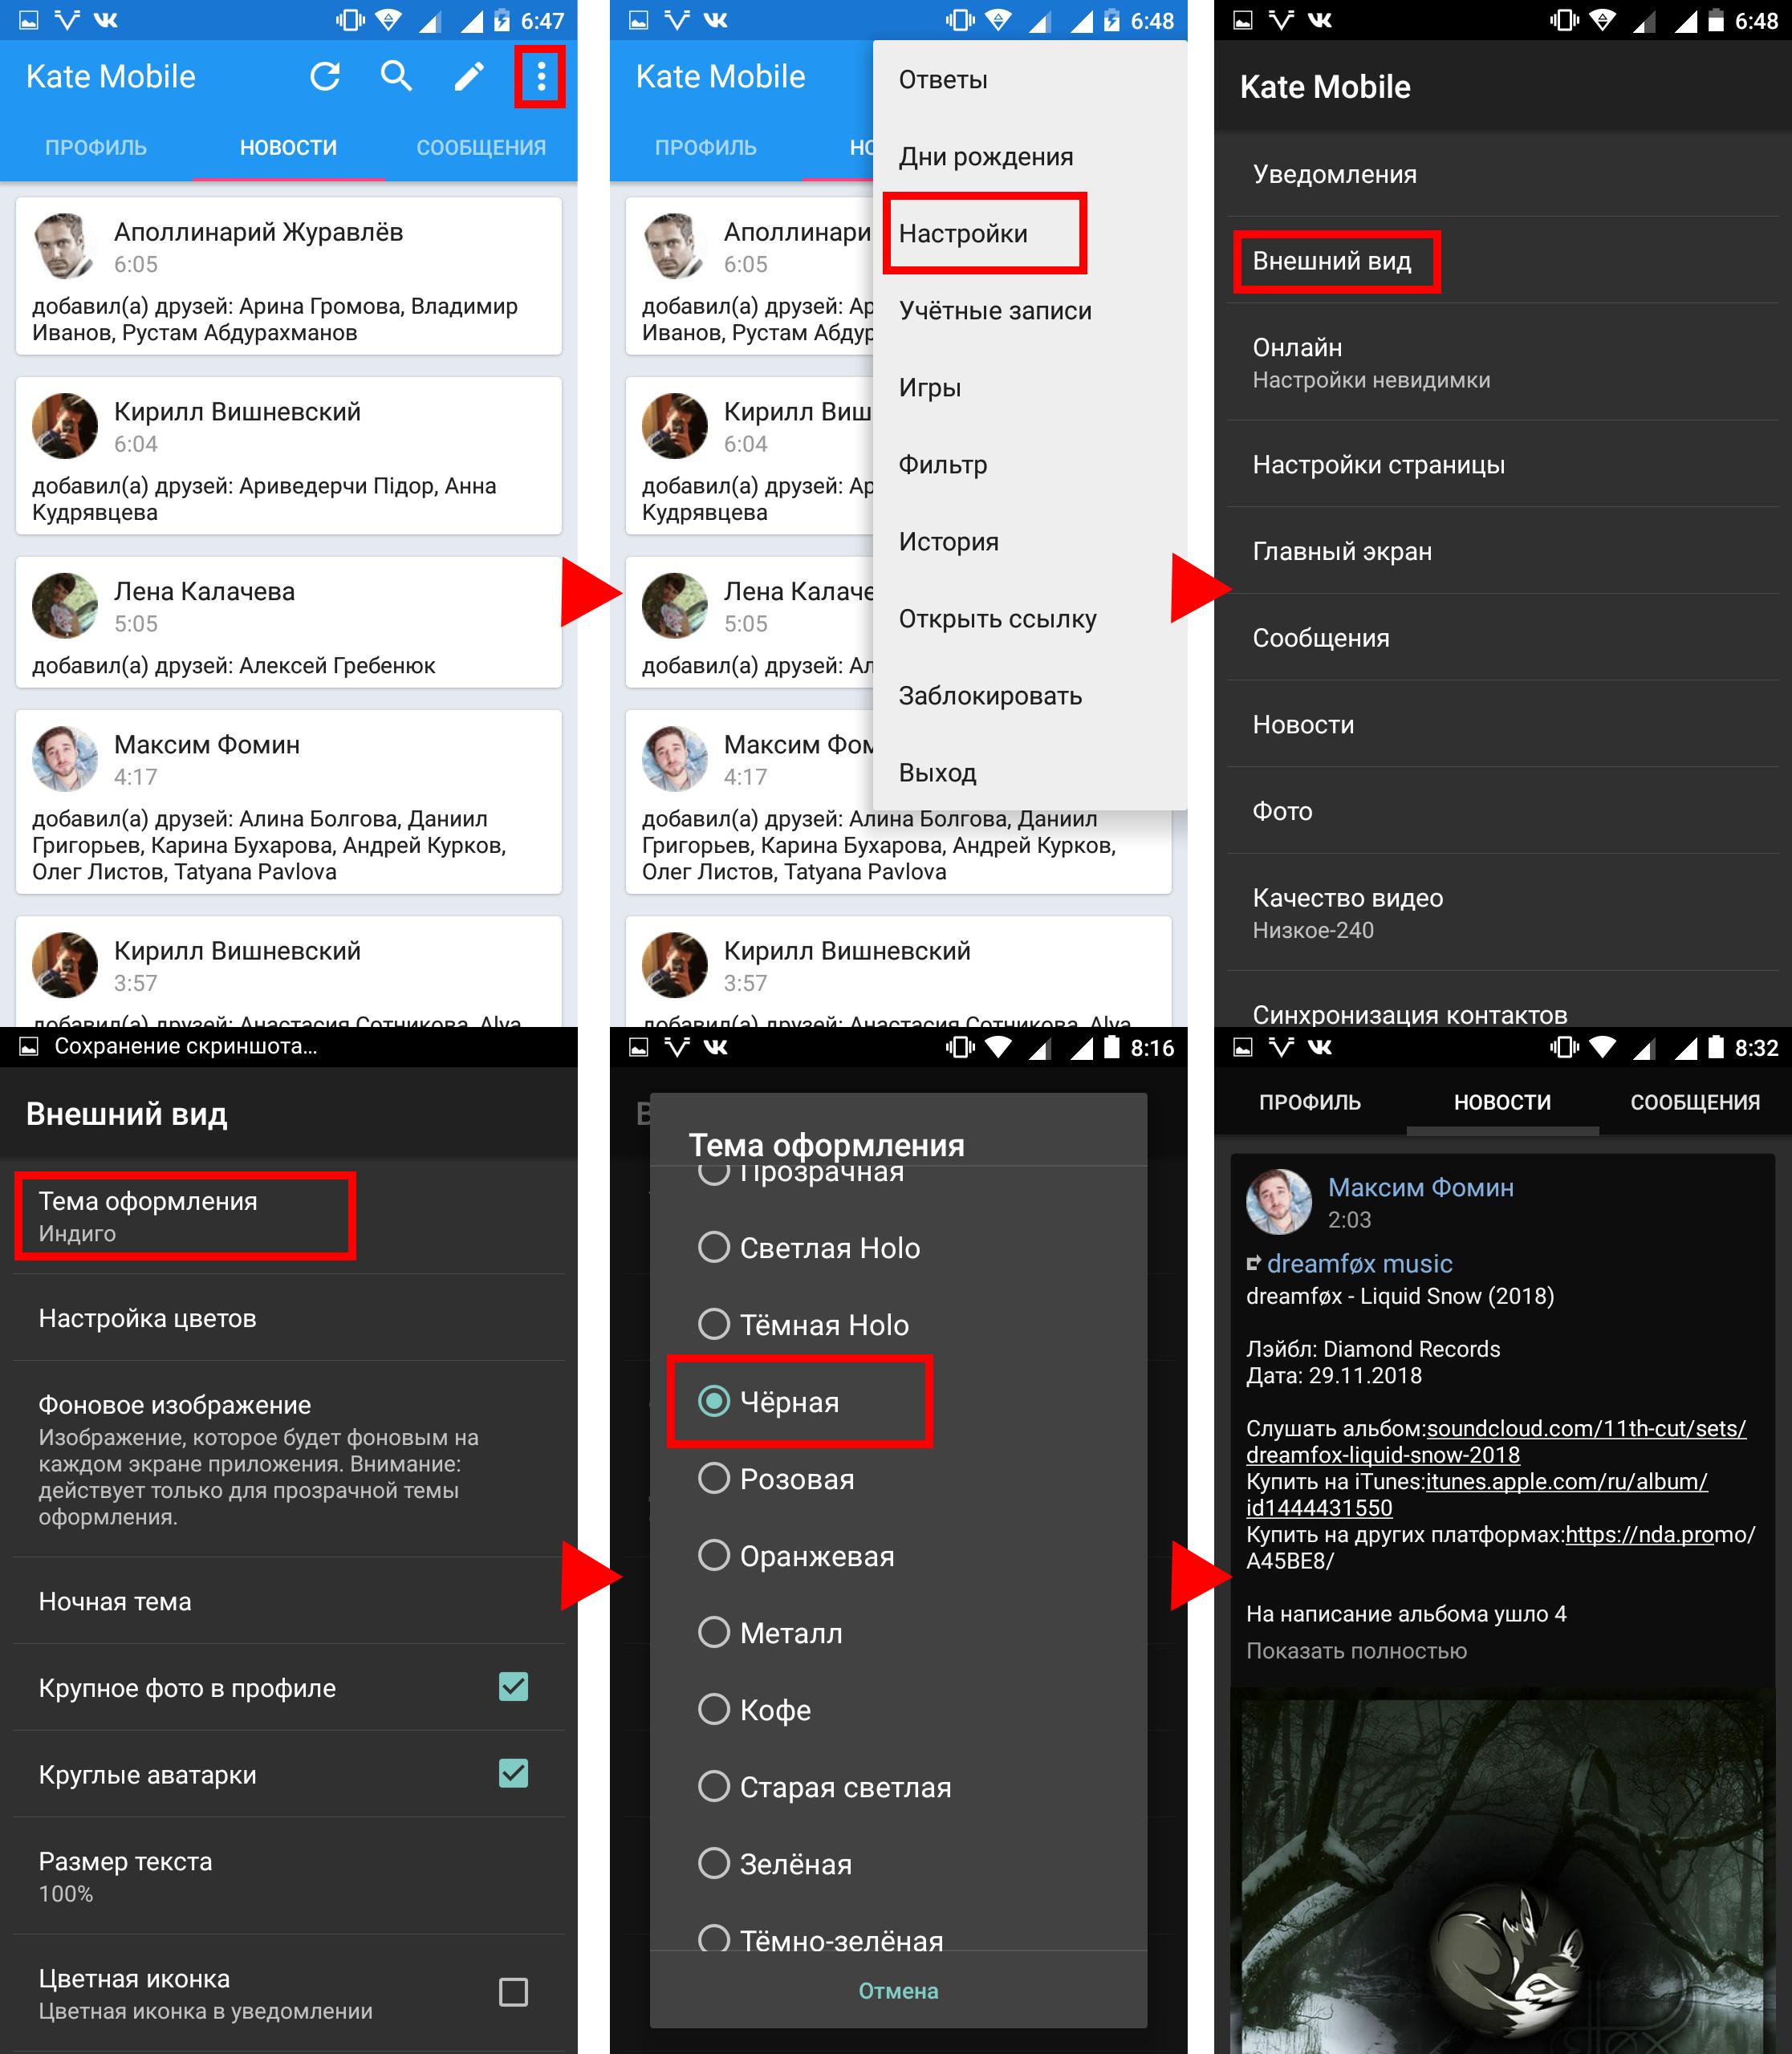 kak-sdelat-vk-chernym-na-telefone-android-kate-mobile.jpg